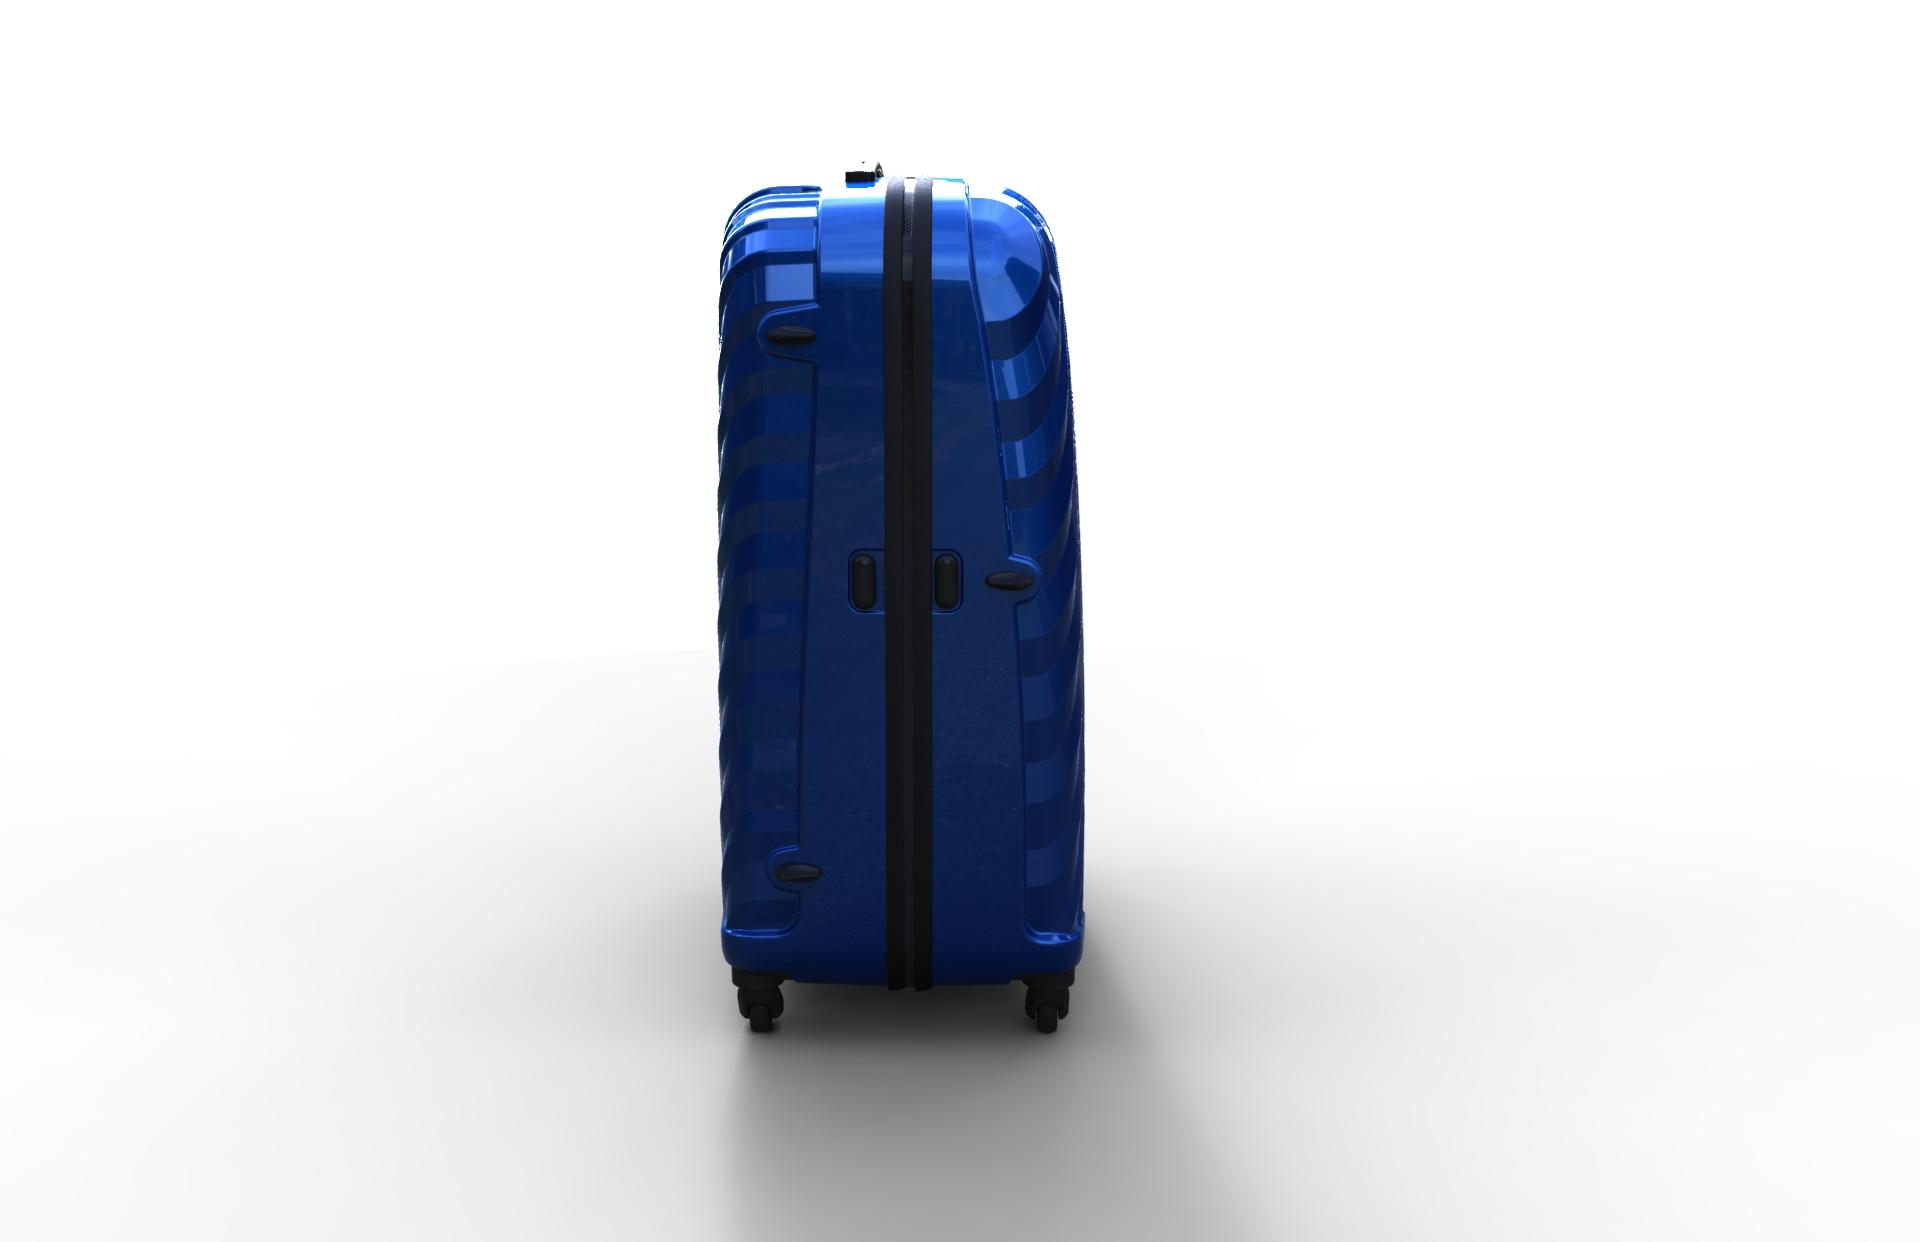 trolley suitcase bag 03 3d model max fbx ma mb obj 286006